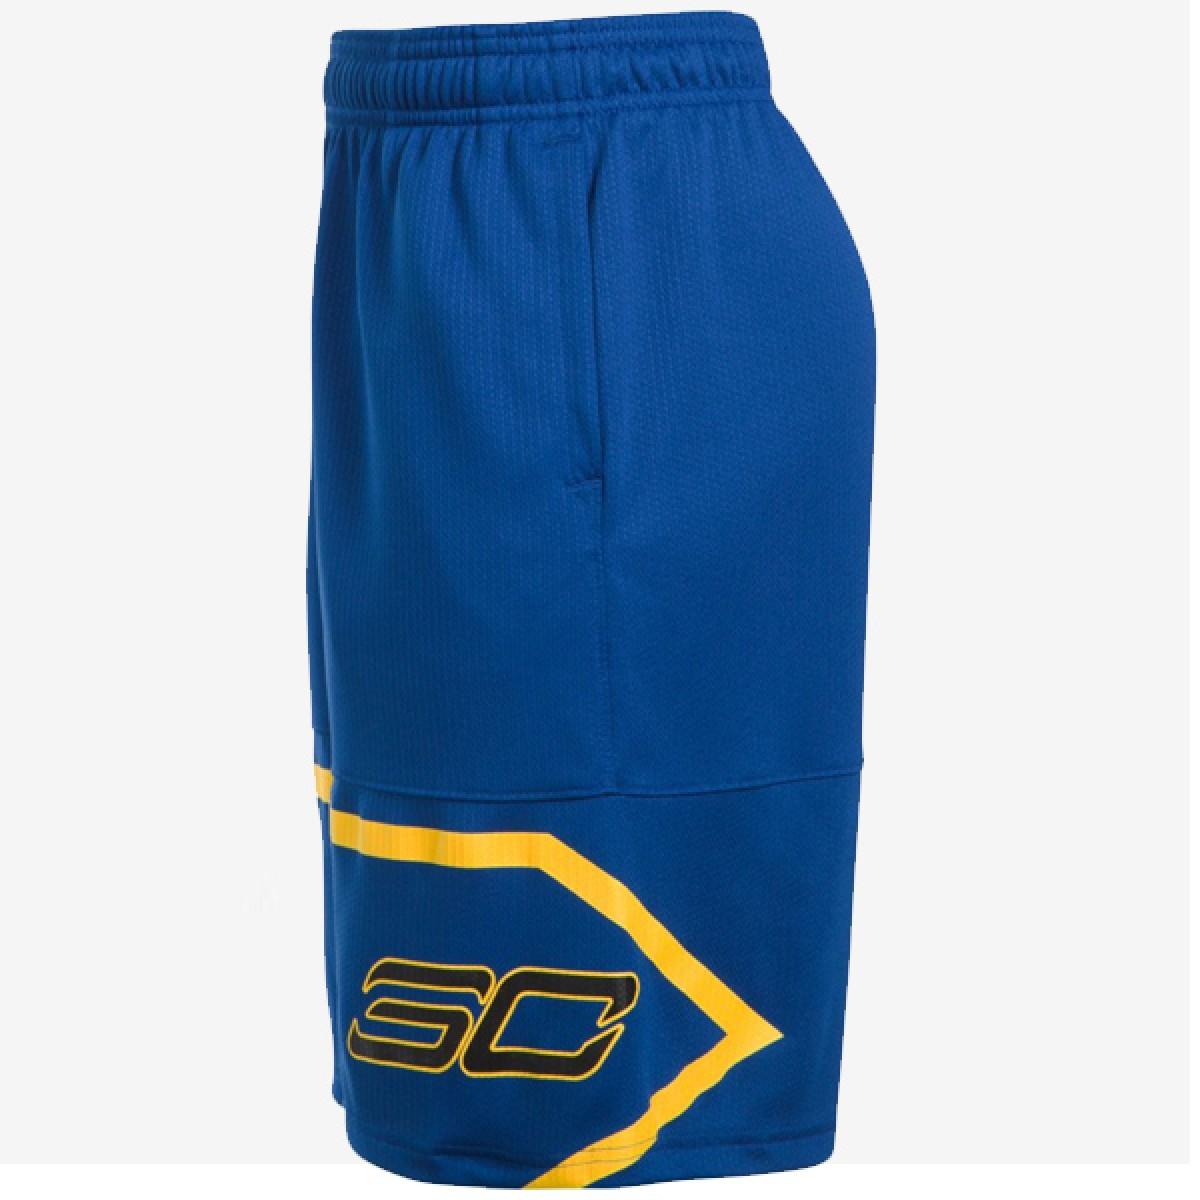 UA SC30 Spear Short 'Blue' 1299312-400